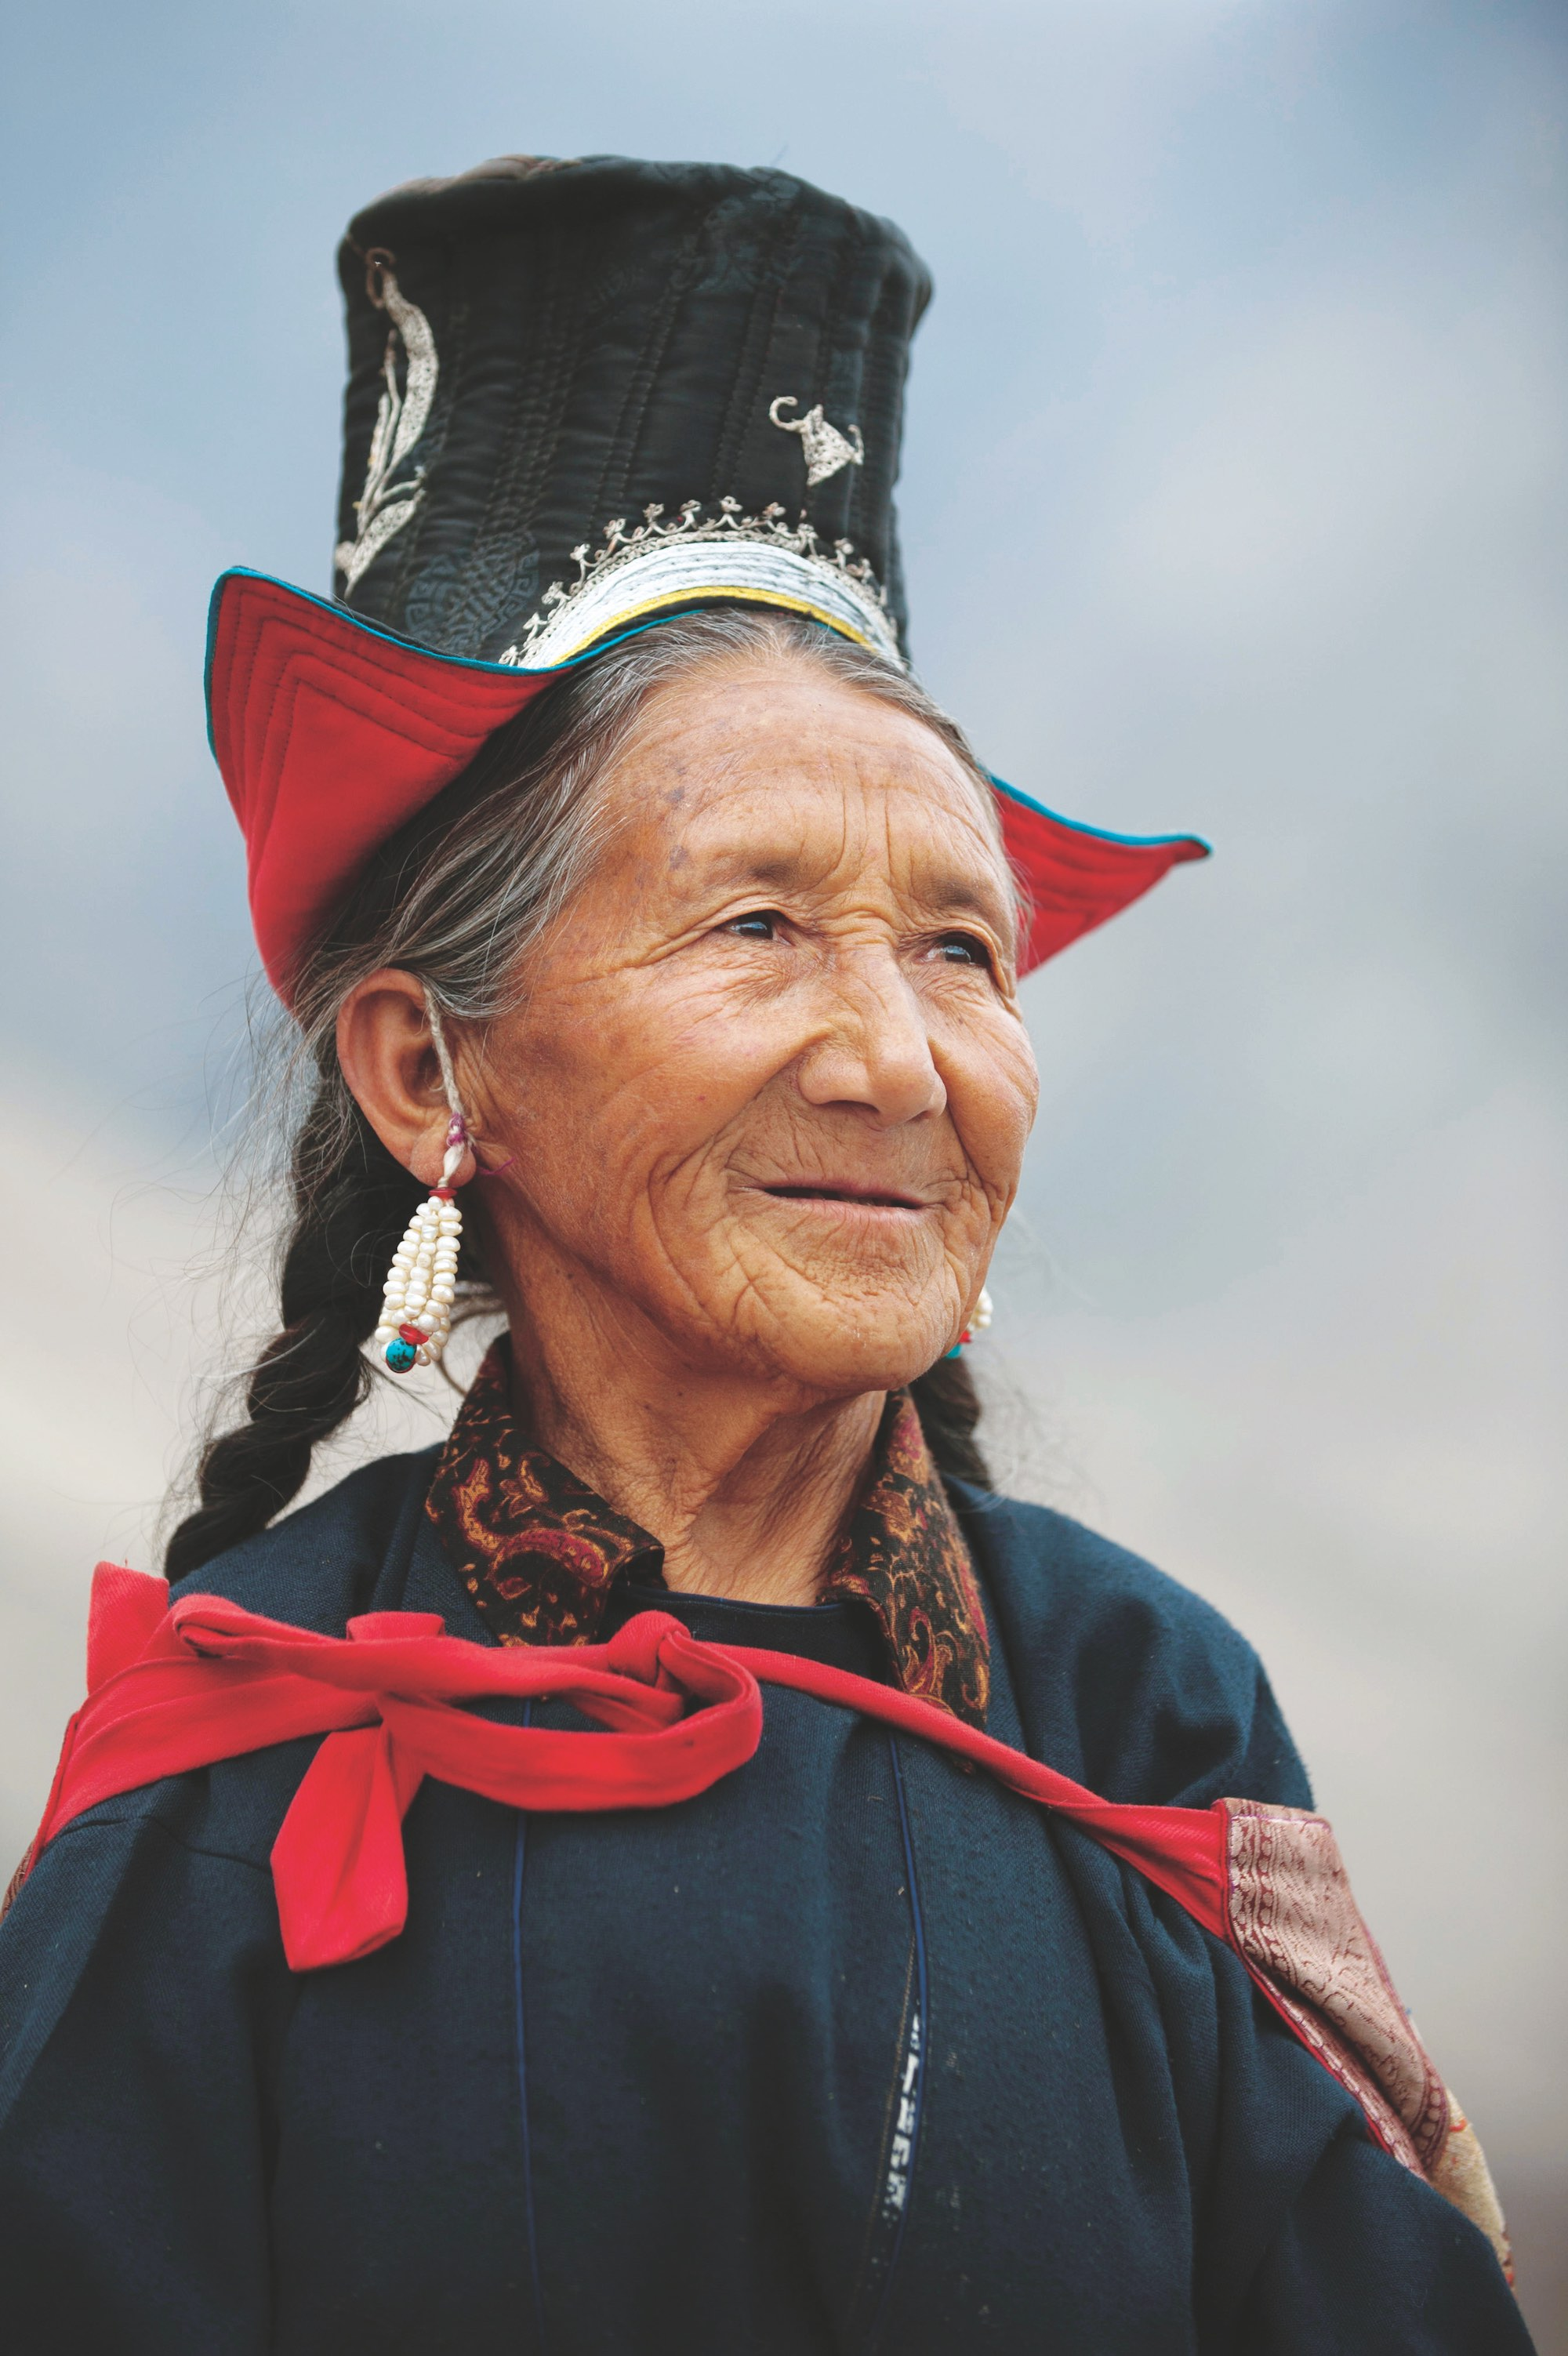 diskit-nubra-valley-ladakh-india-earnna.jpg